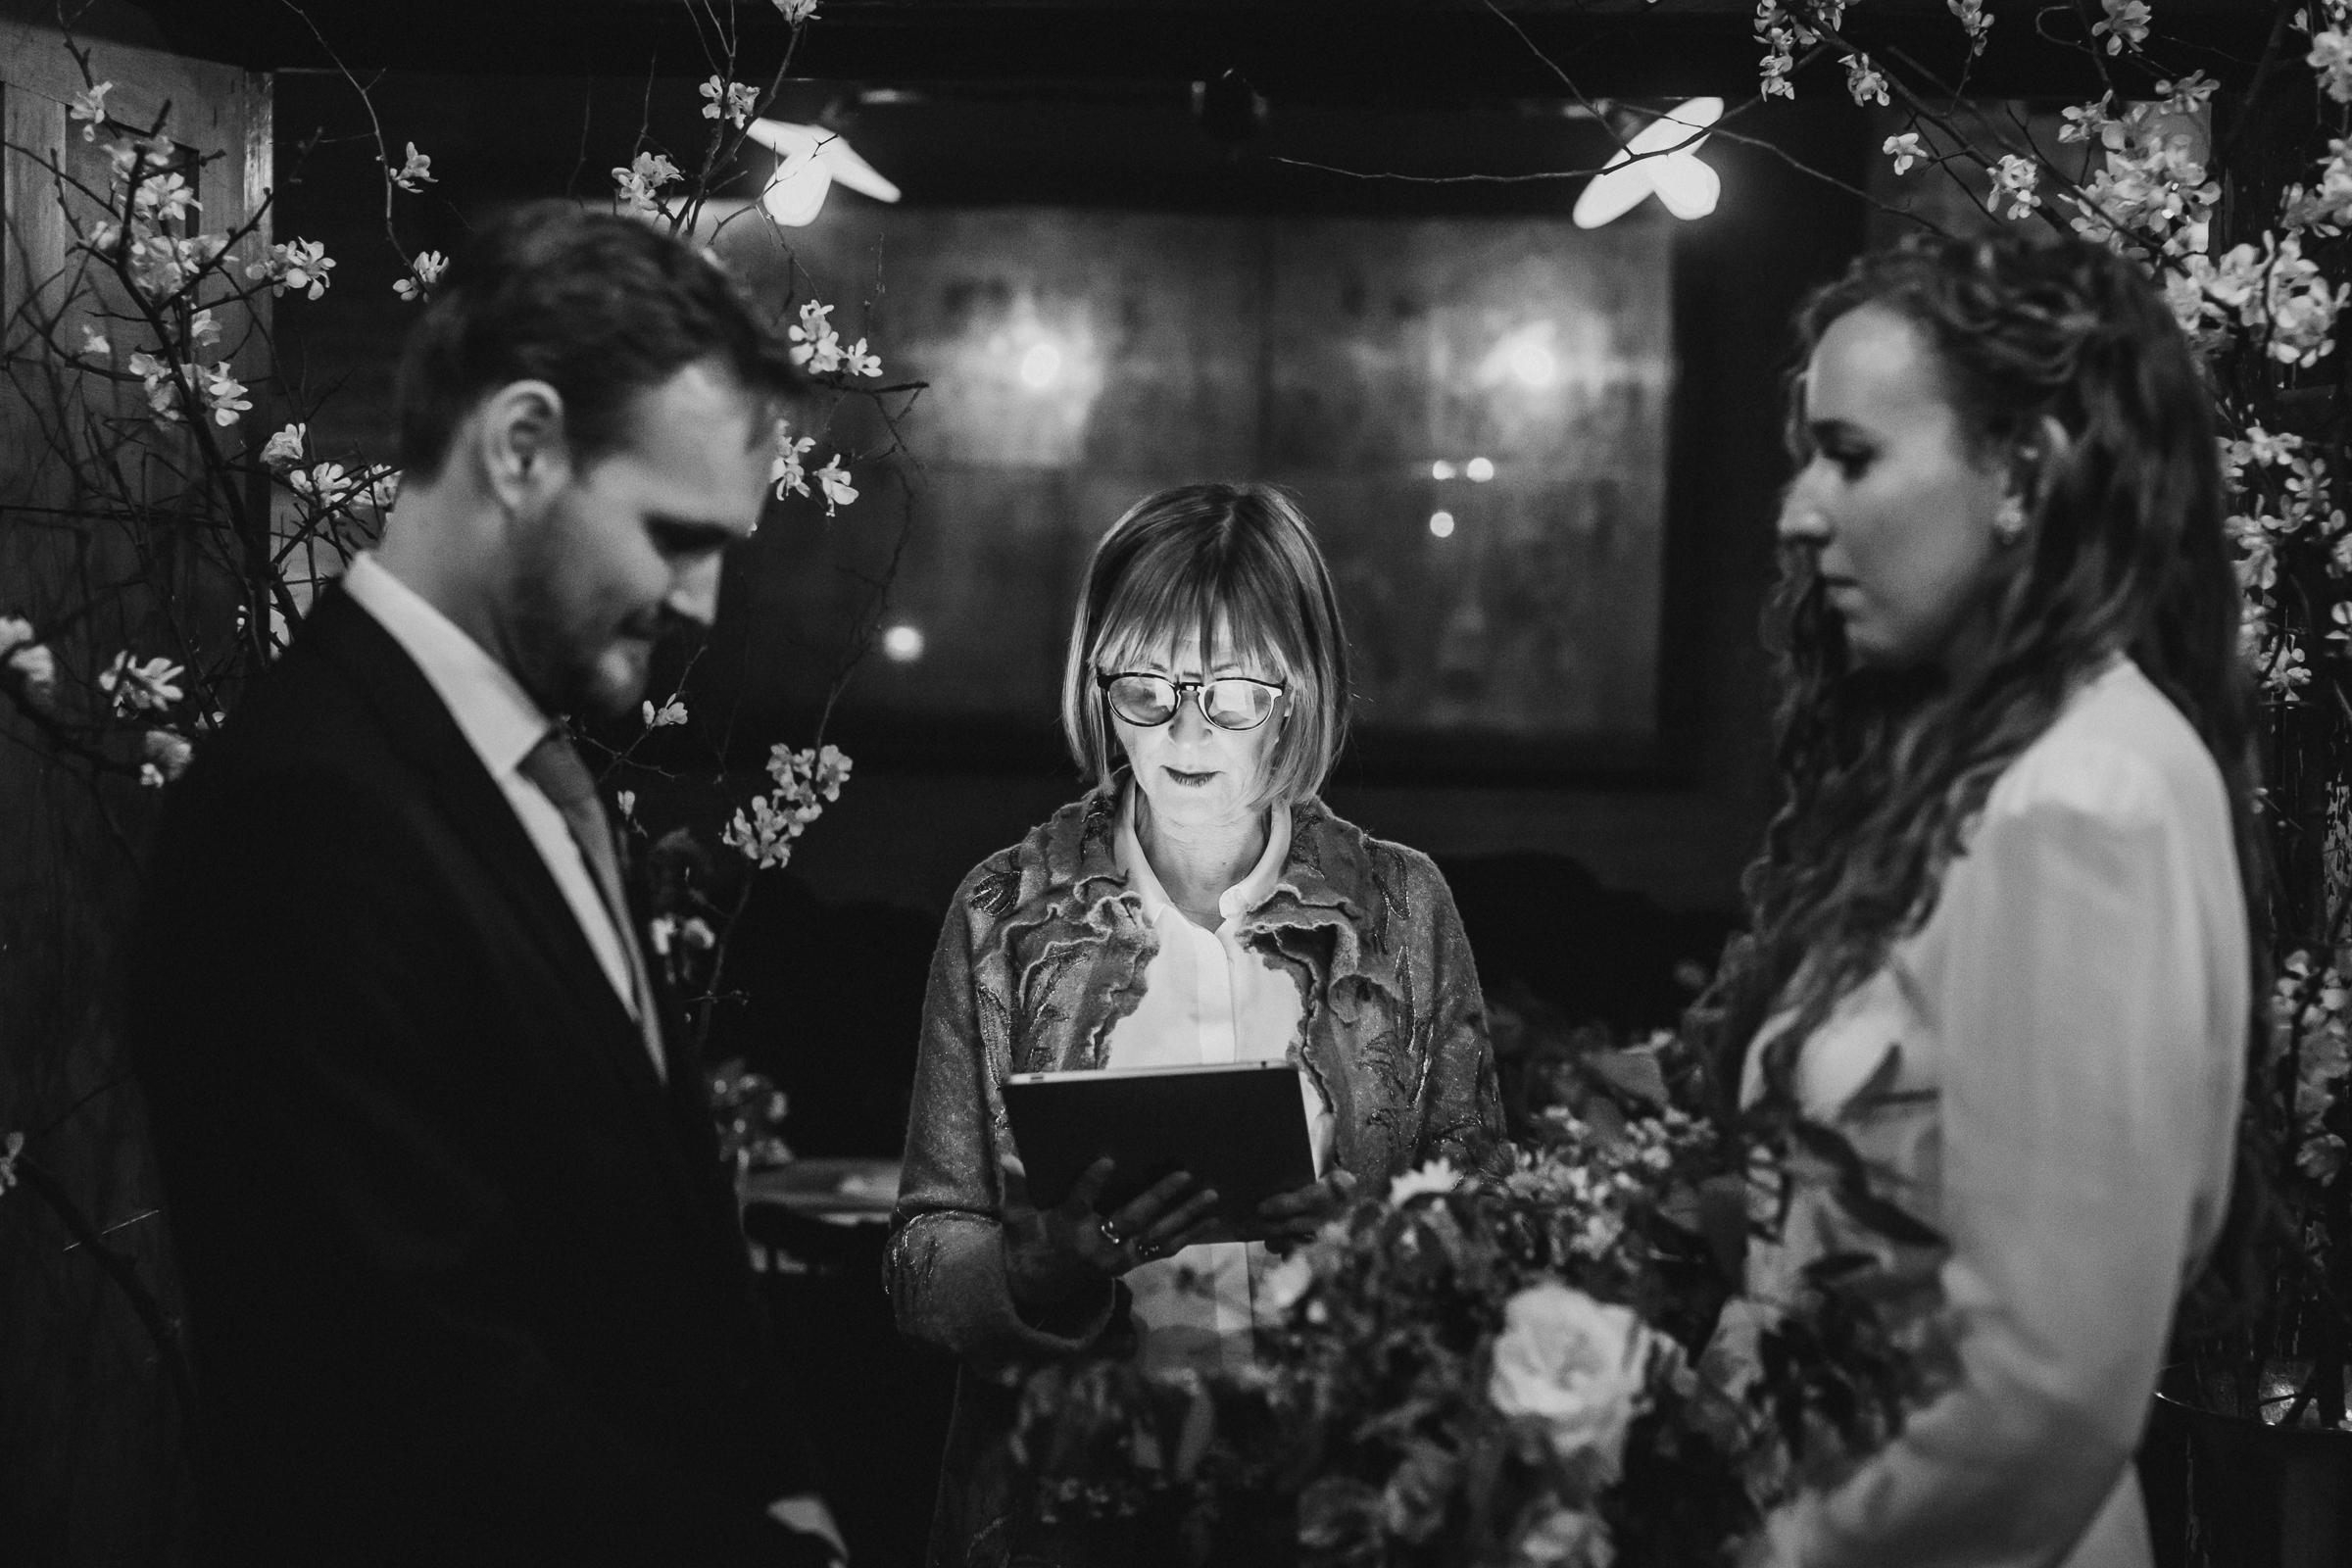 Freemans-Restaurant-Soho-Brooklyn-Bridge-Park-Dumbo-Documentary-Wedding-Photographer-45.jpg